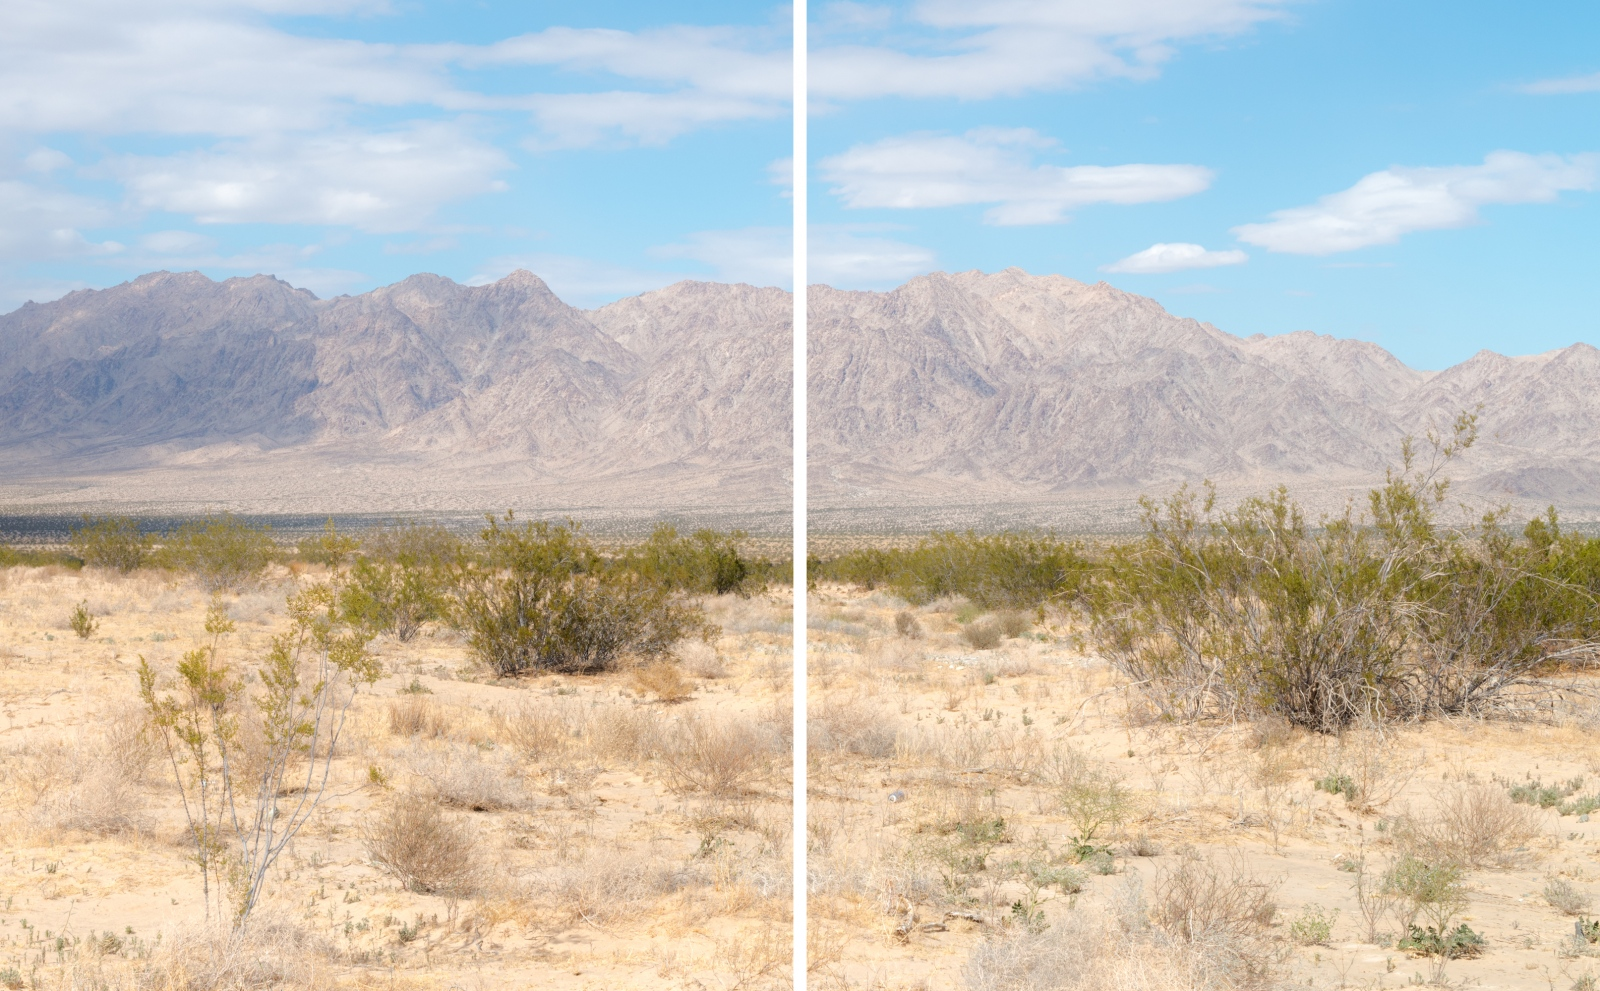 Art and Documentary Photography - Loading 2xcreosotelandscape.jpg